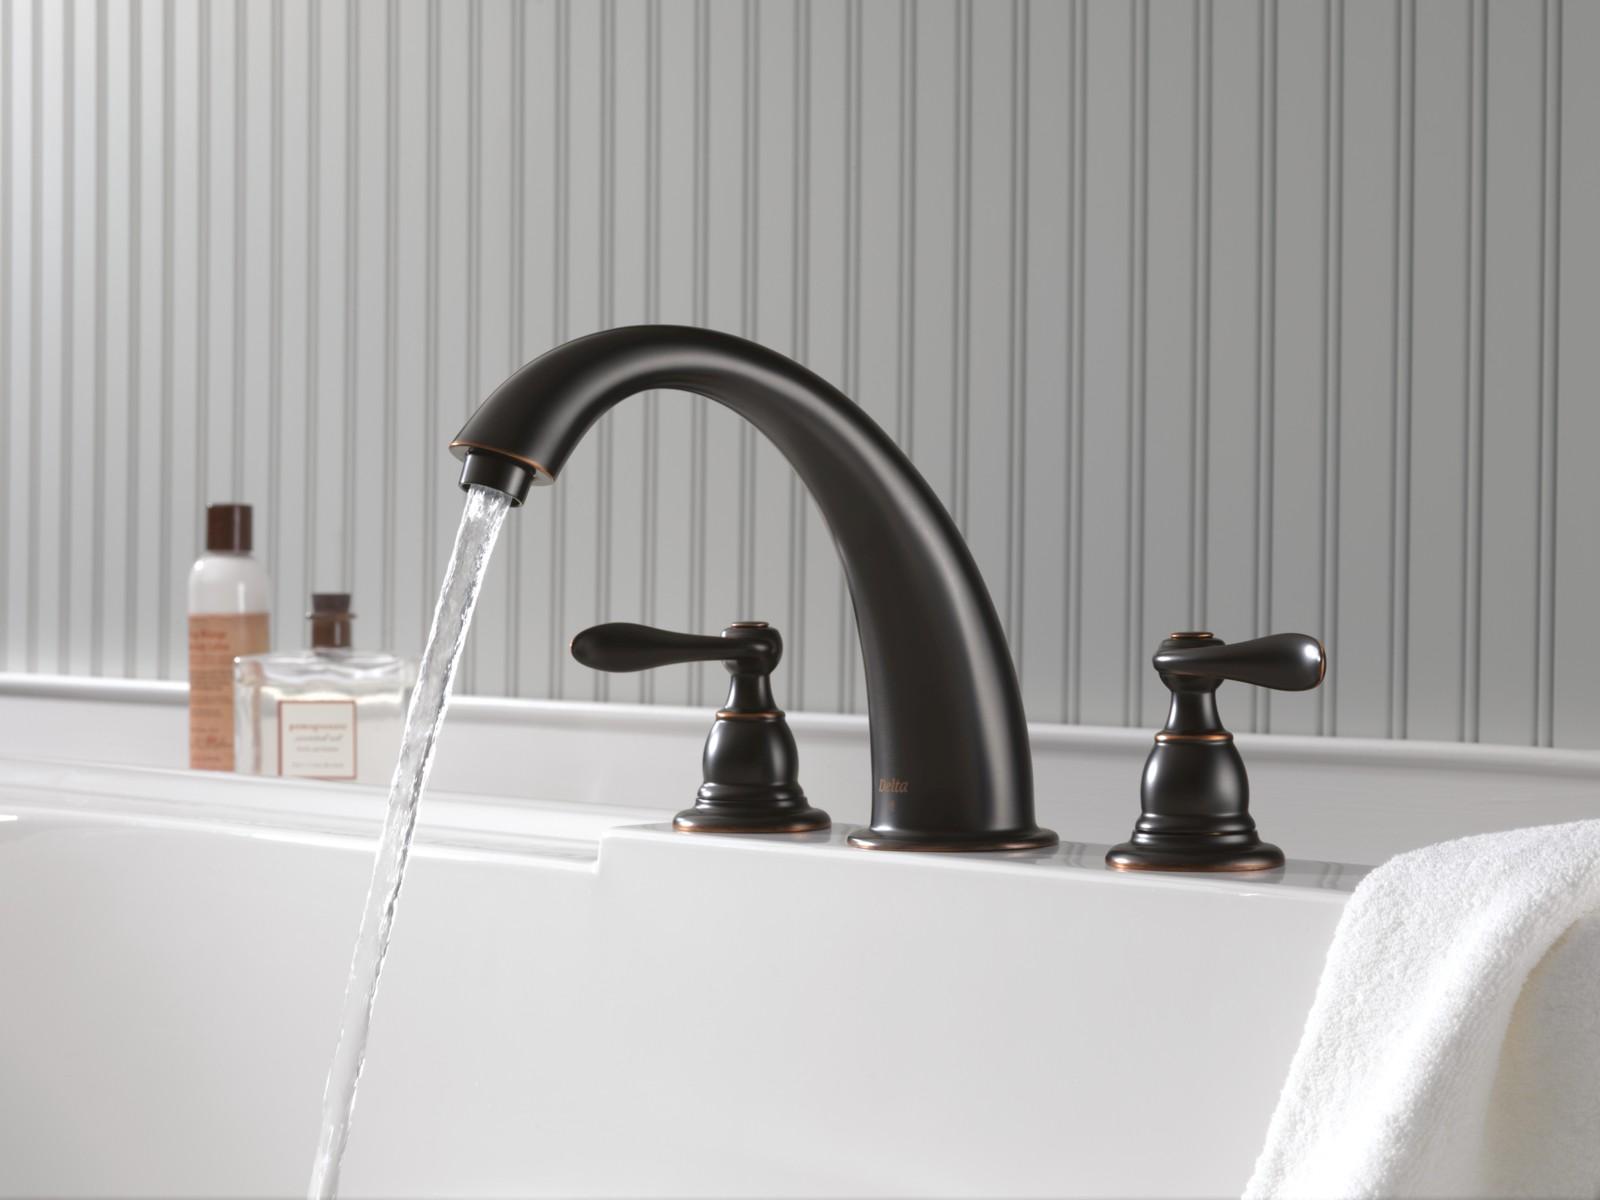 Delta Windemere Bathroom Faucet Beautiful Delta Windemere Bathroom Faucet Check More at Décor